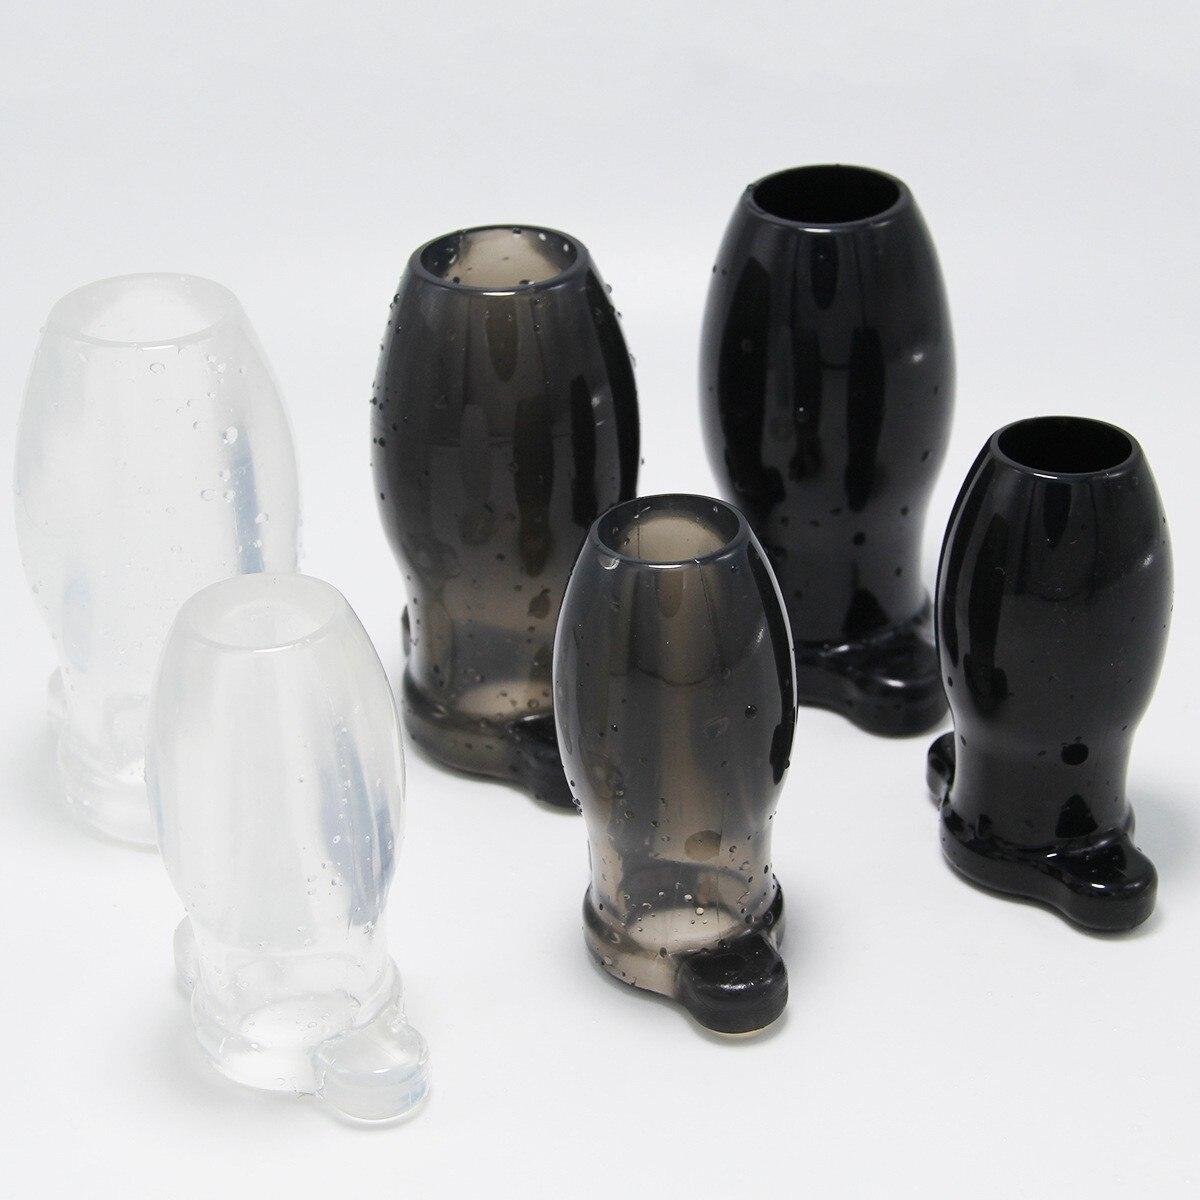 ¡3 colores hueco Enemator idiota Plug Anal Vagina Anal limpiador Anal dilatador Peep Buttplugs espéculo juguetes sexuales adultos para parejas!